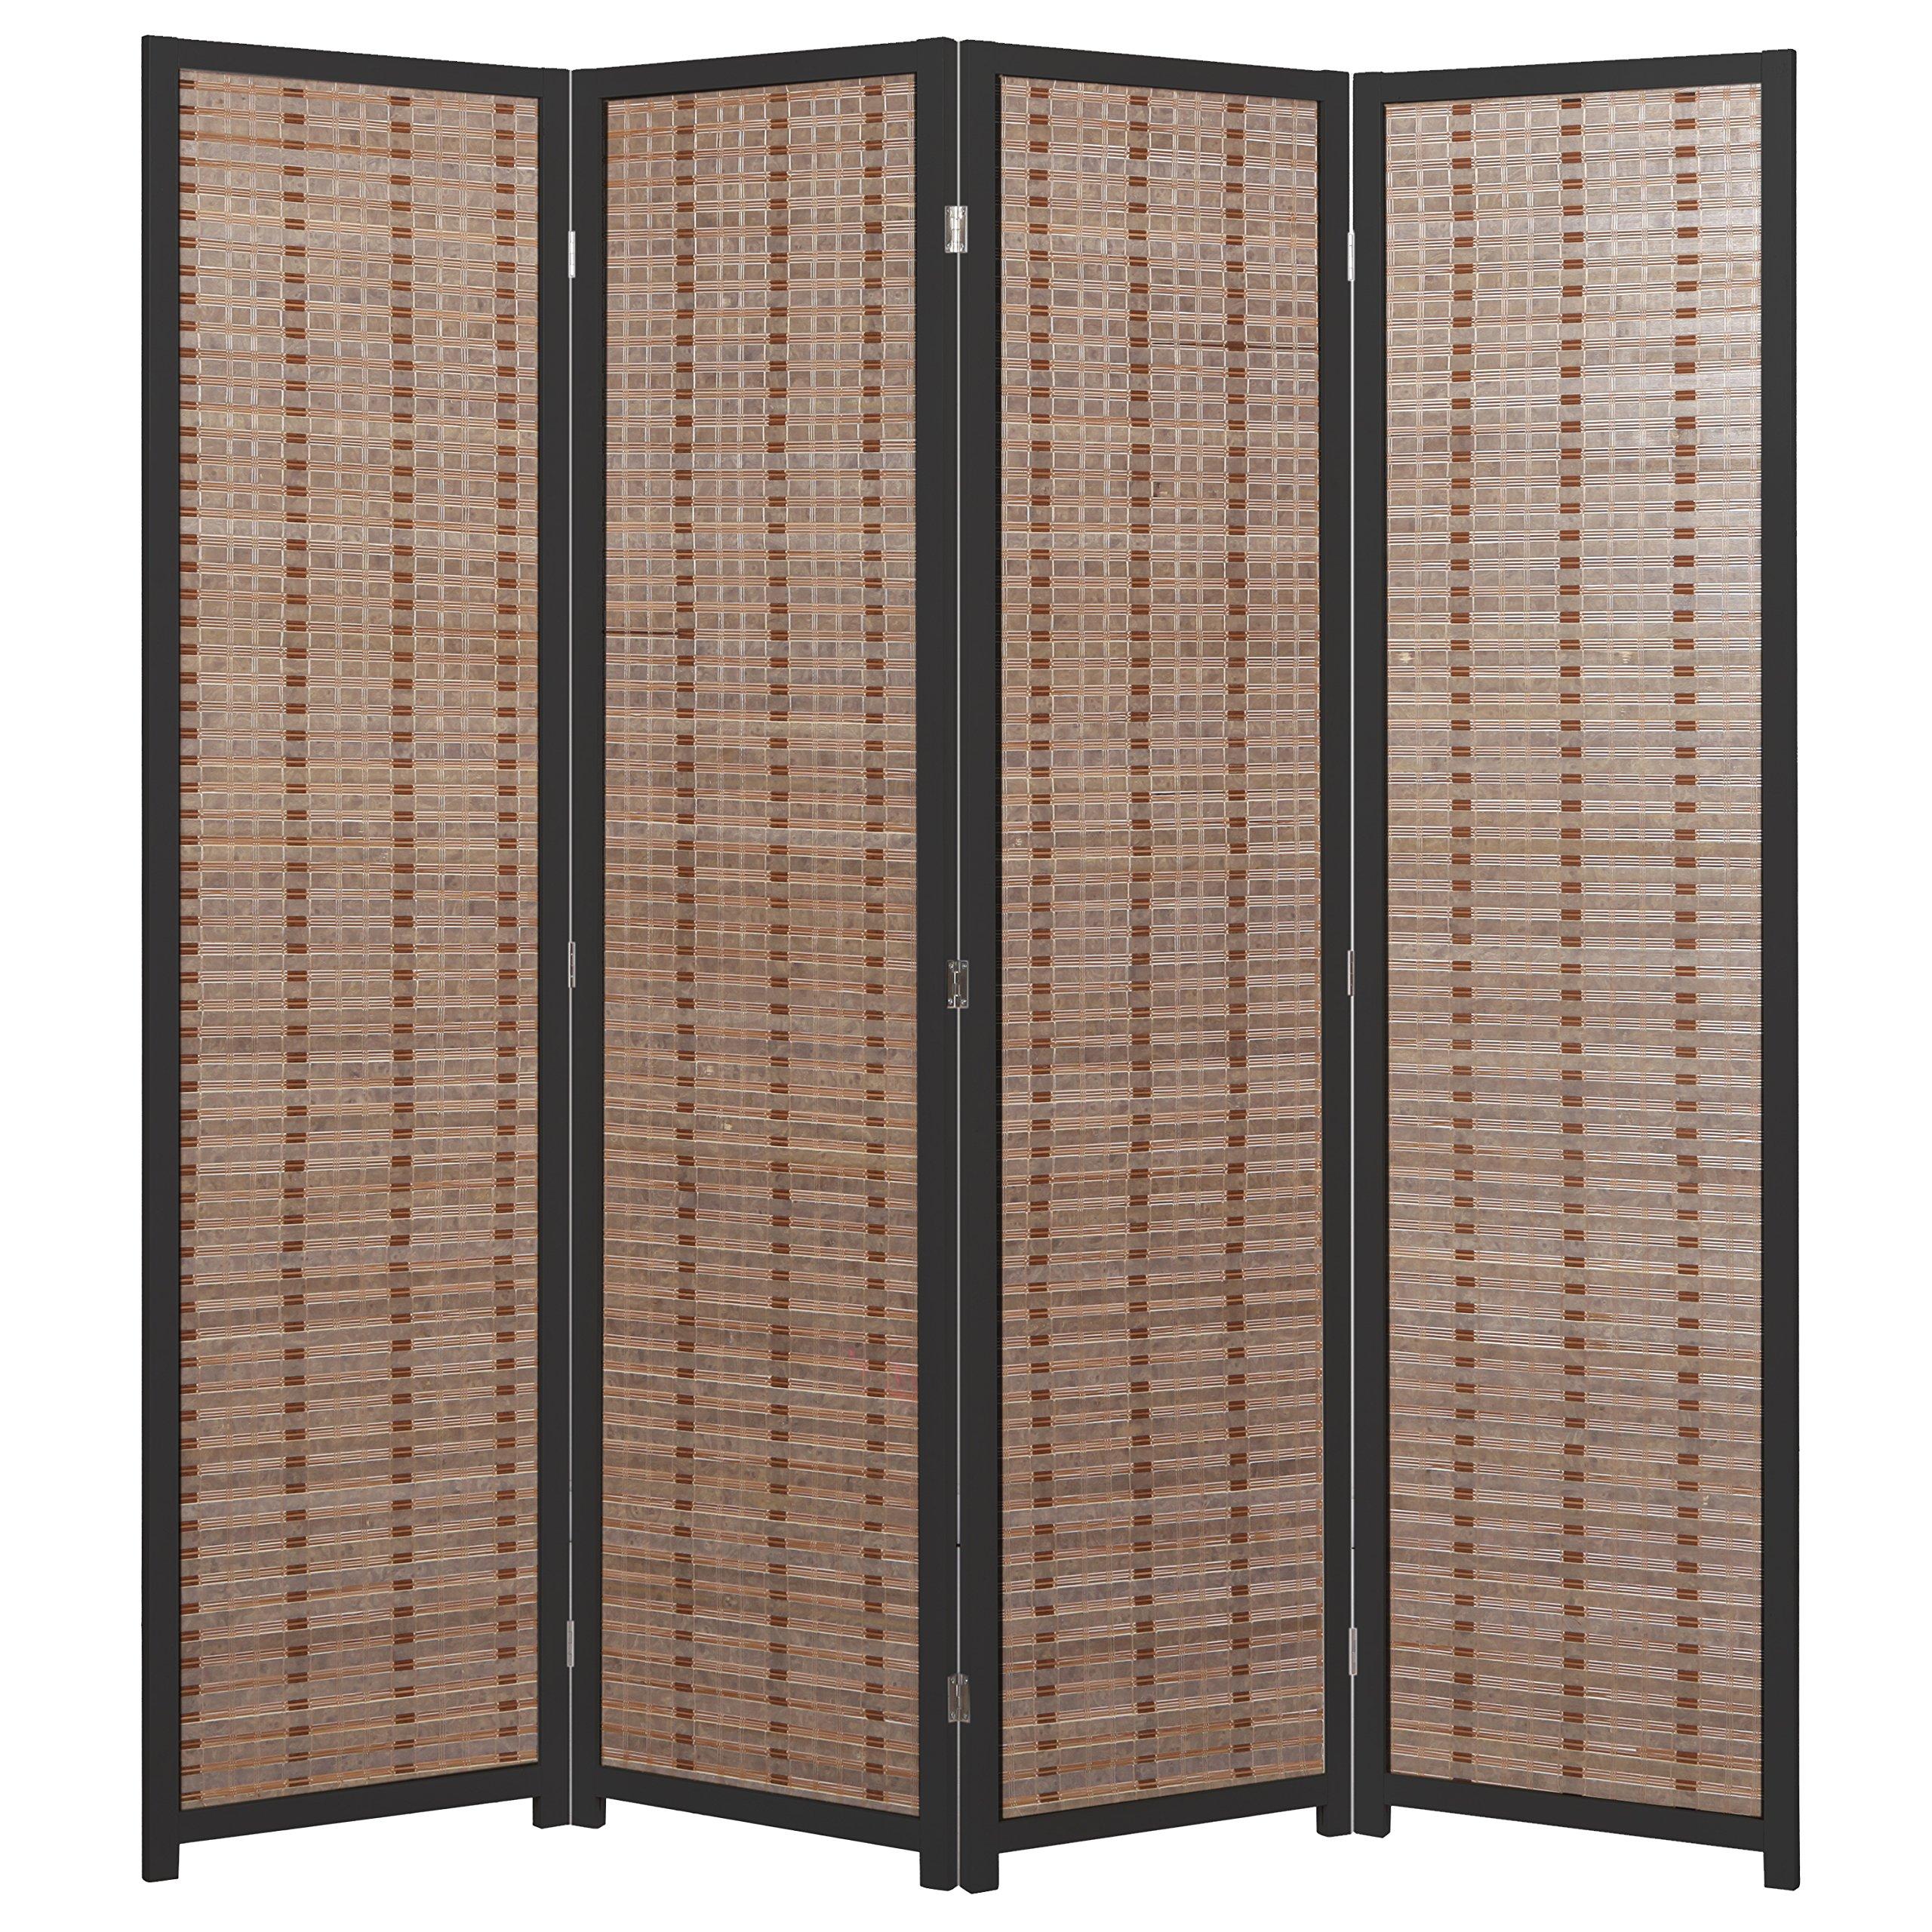 MyGift Decorative Openwork Design 4-Panel Bamboo & Black Wood Framed Folding Screen/Freestanding Room Divider by MyGift